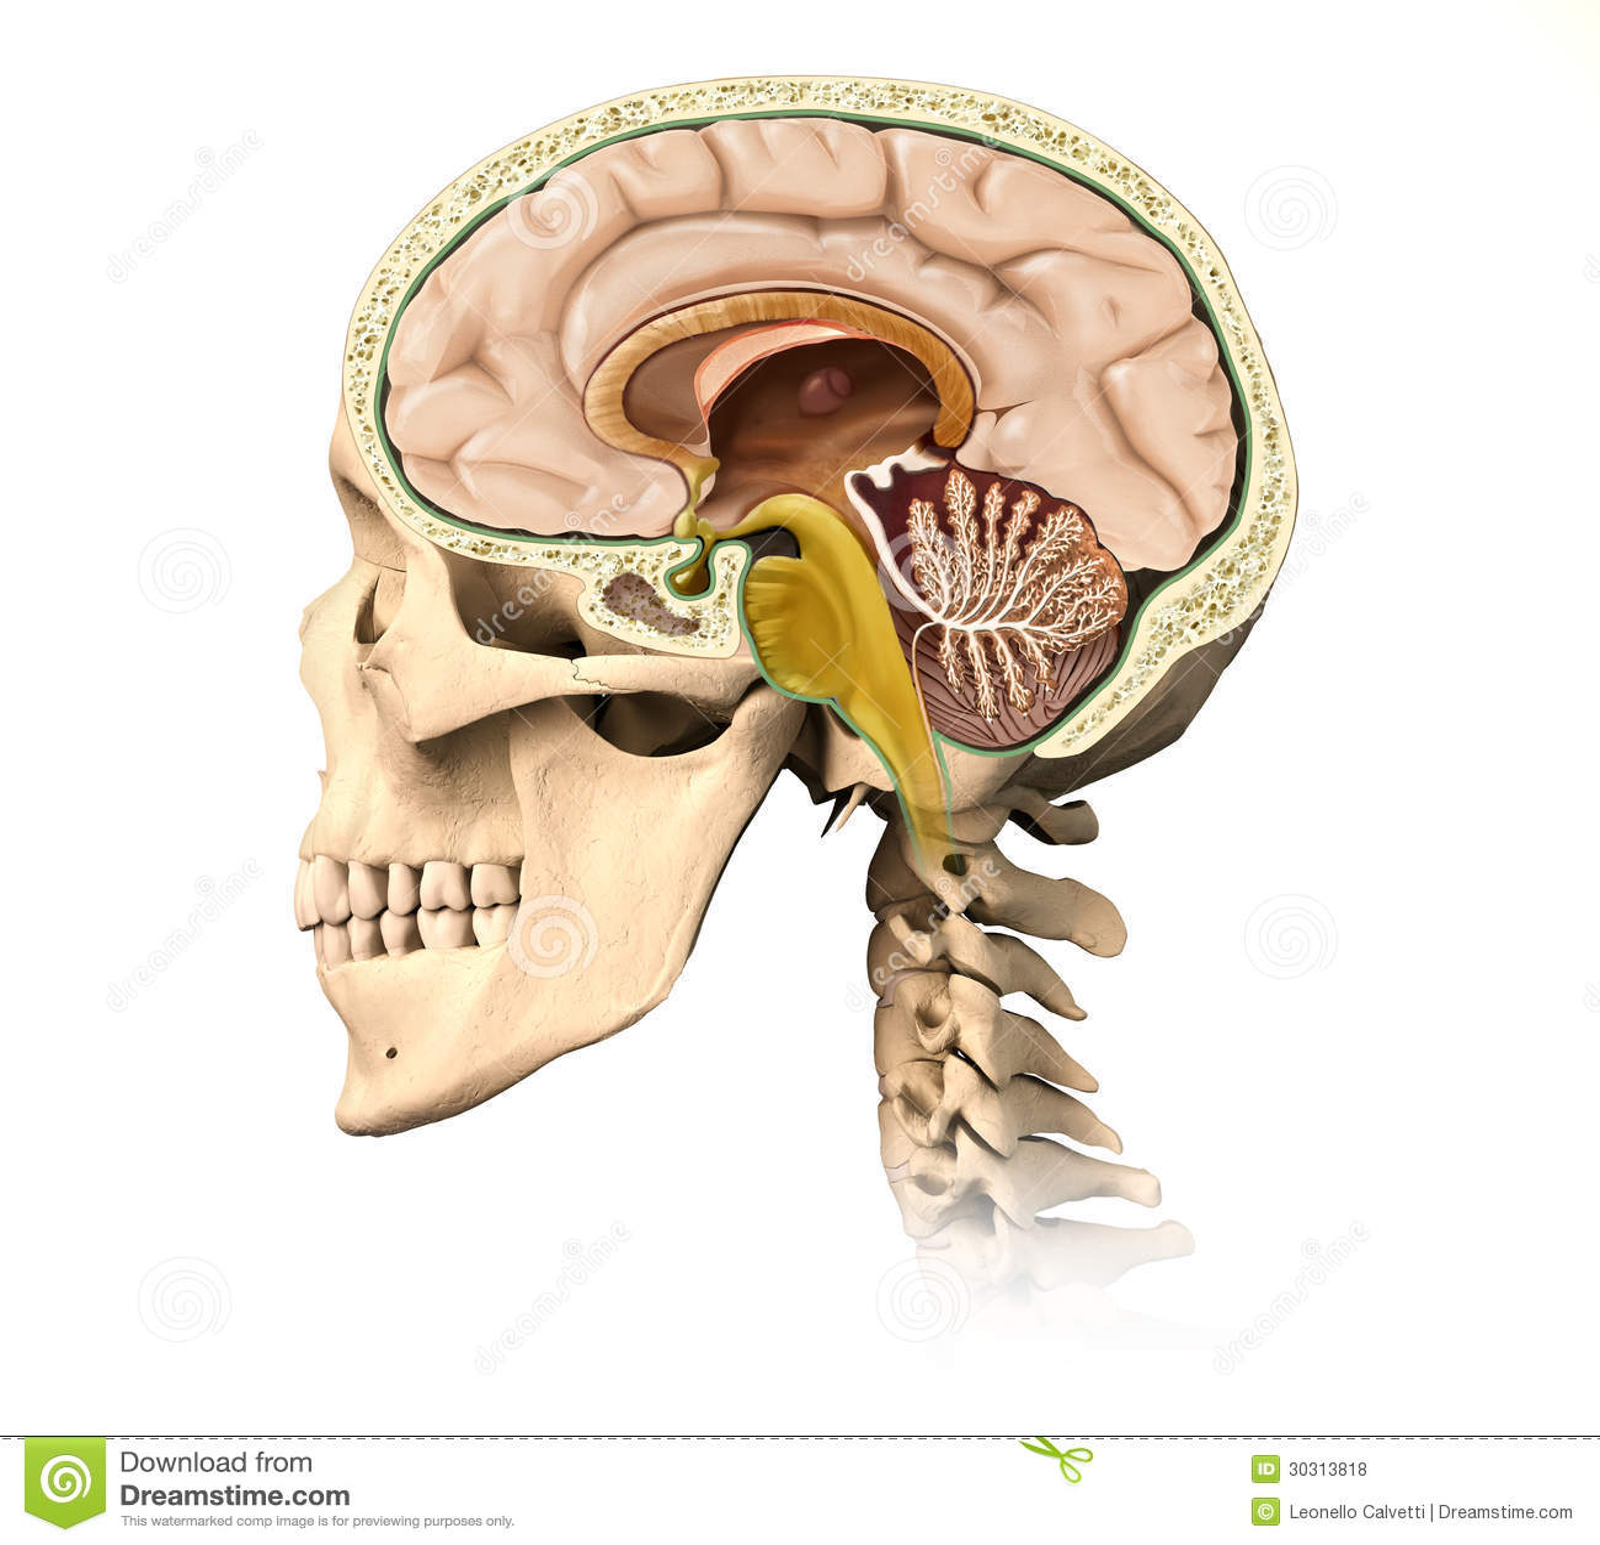 human skull cutaway with all brain details mid sagittal side v